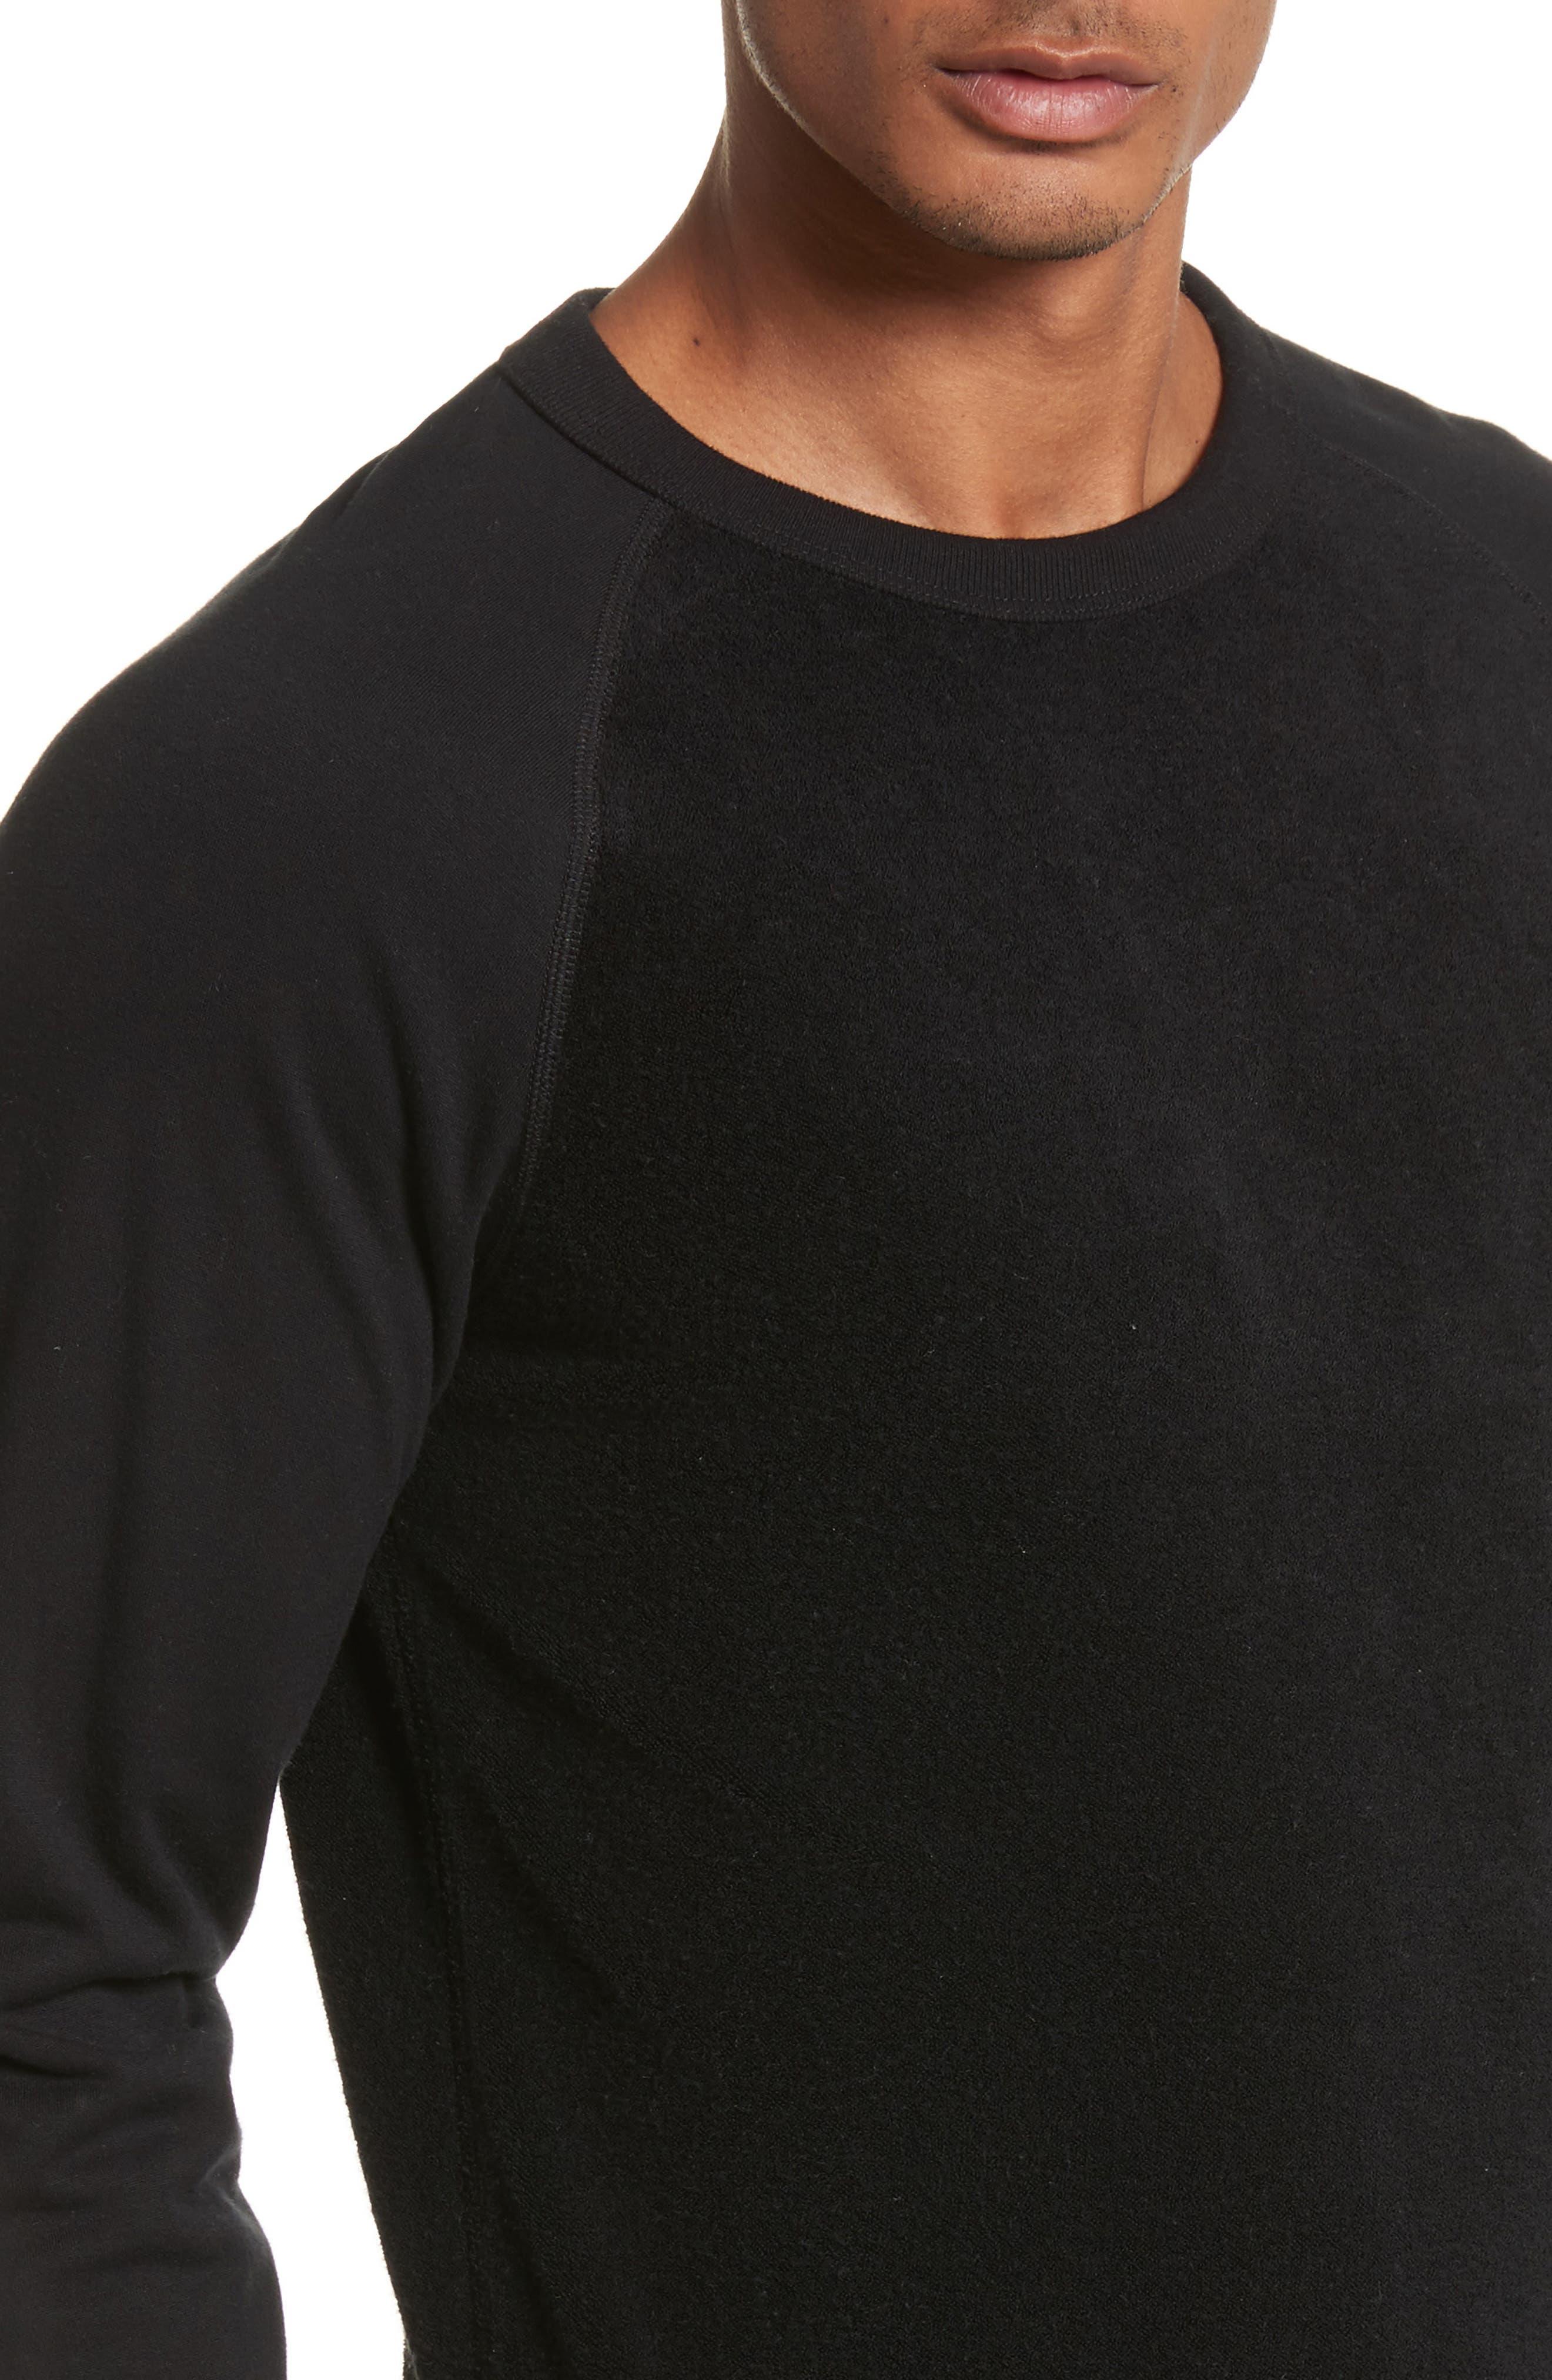 Textured Crewneck Pullover,                             Alternate thumbnail 4, color,                             Black